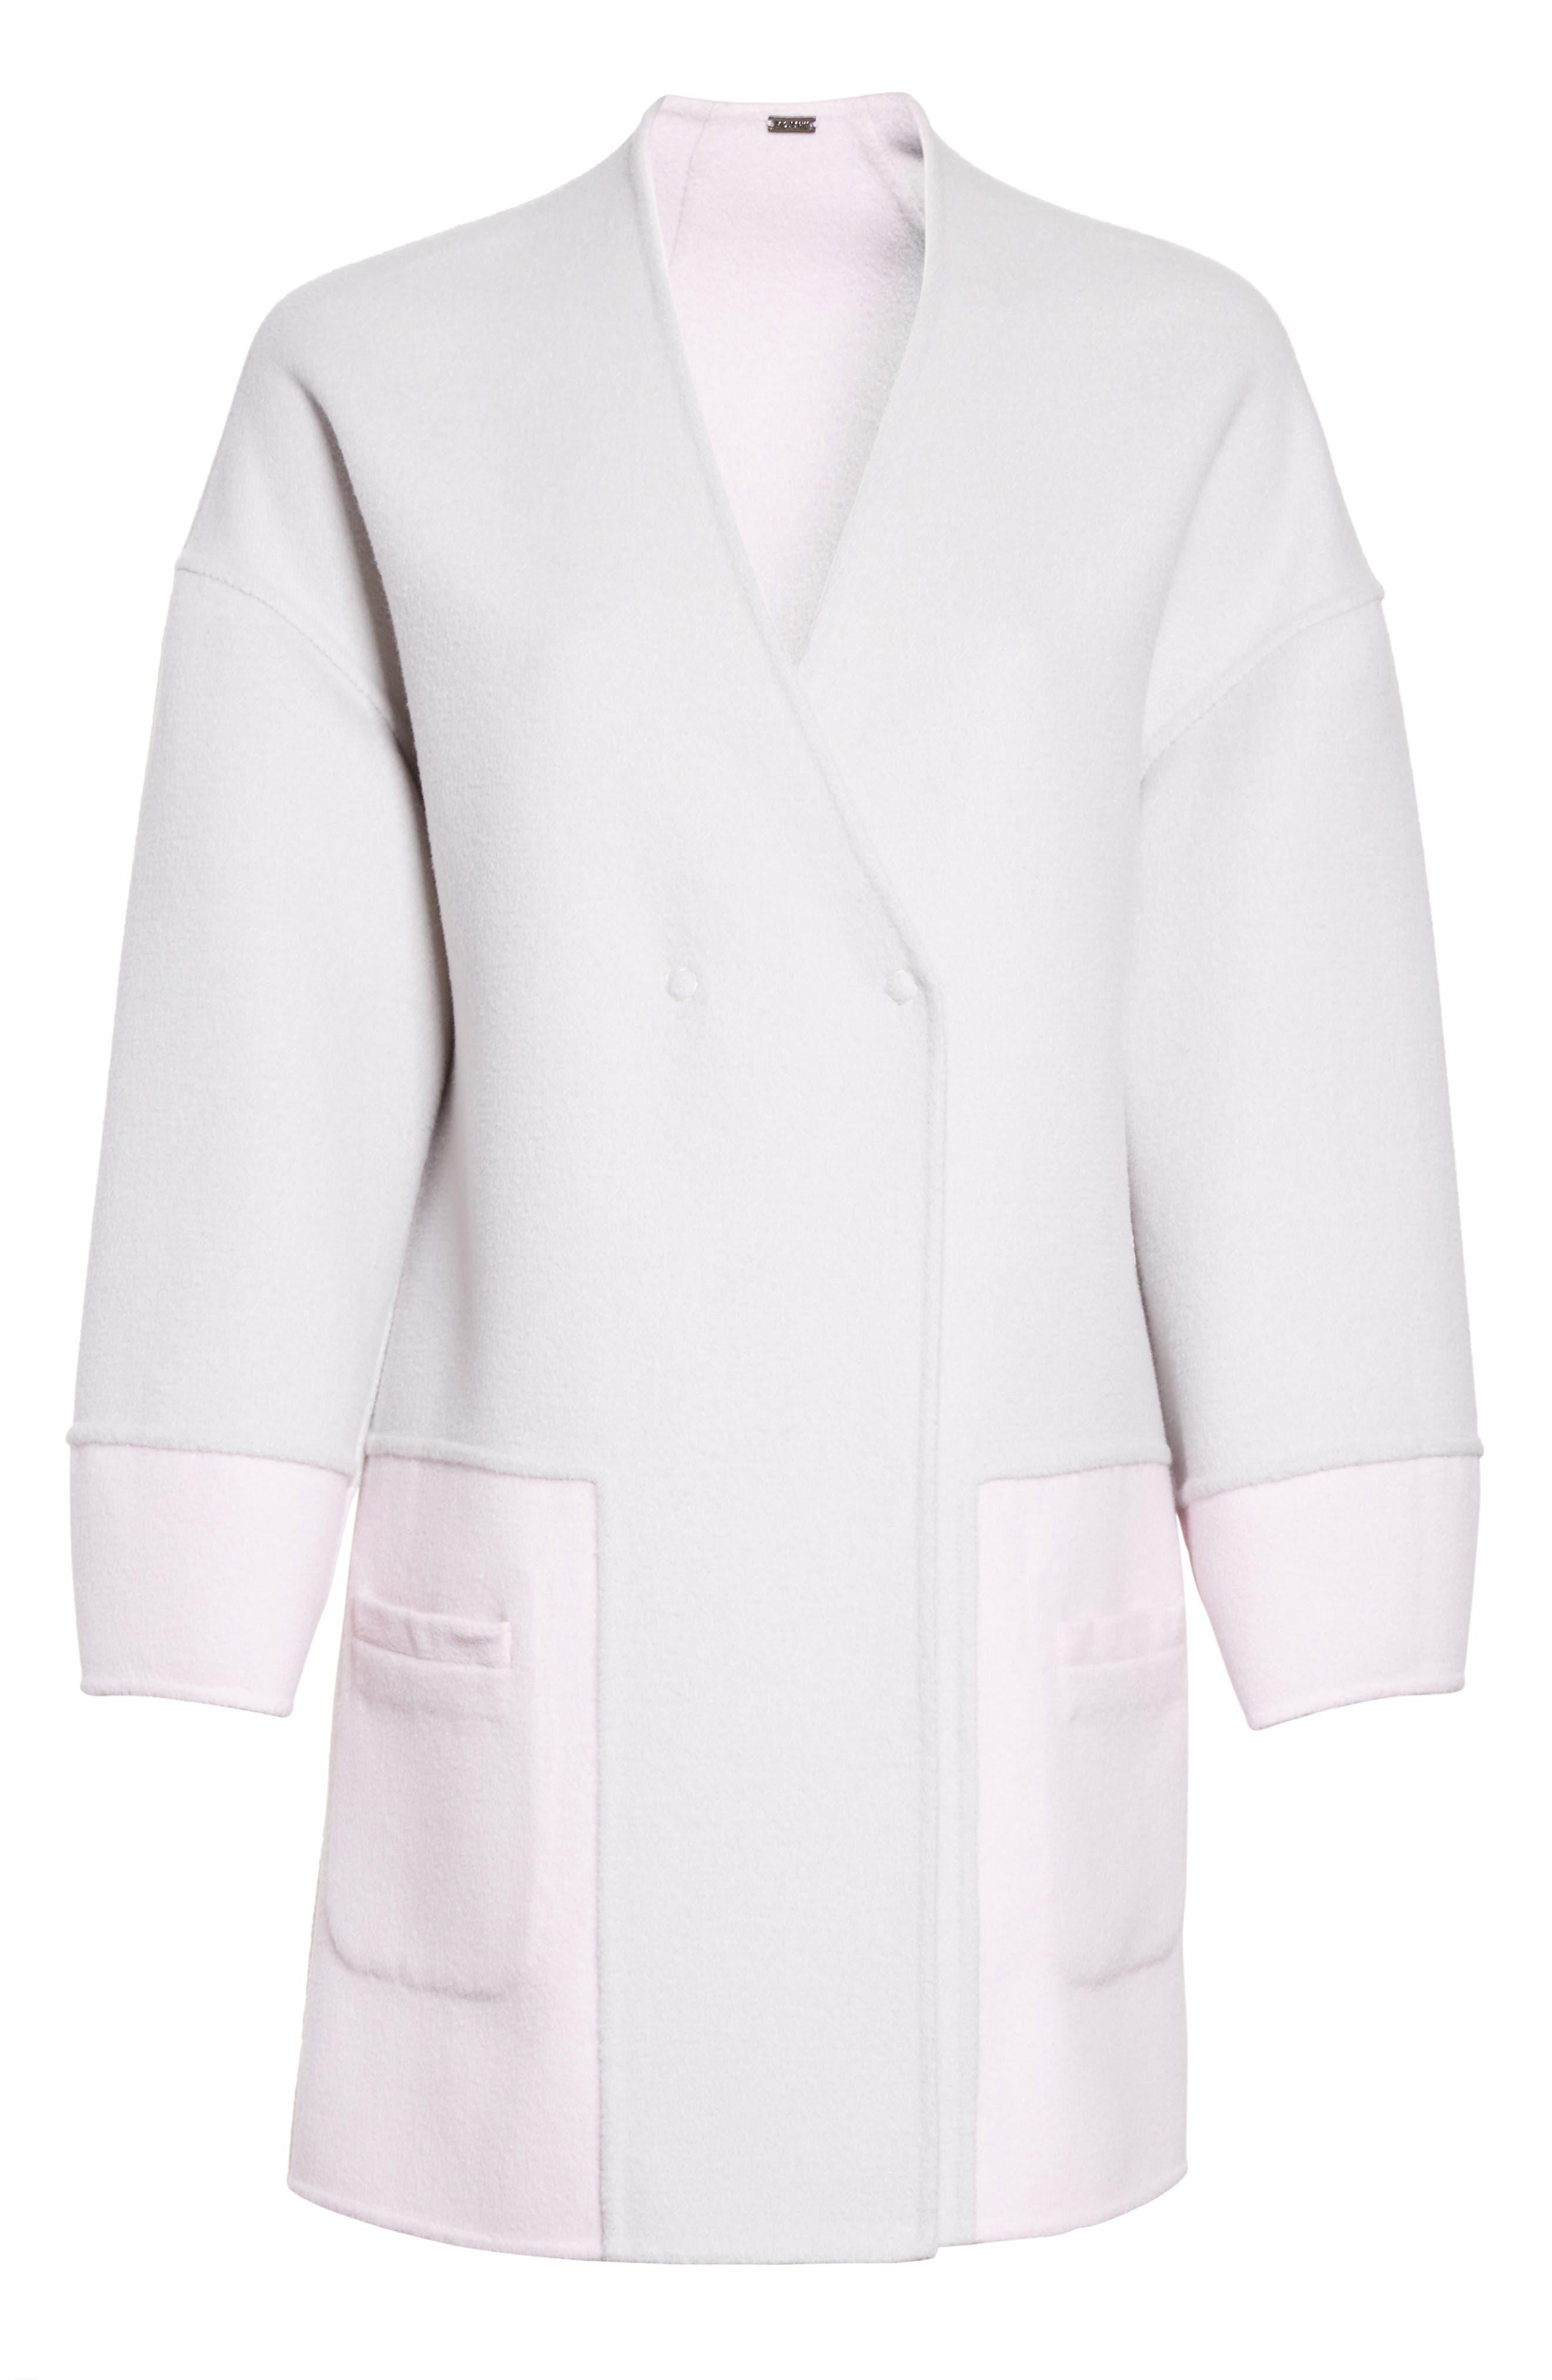 Reversible Wool Blend Cocoon Coat,                             Alternate thumbnail 7, color,                             Petal/ Light Grey Melange